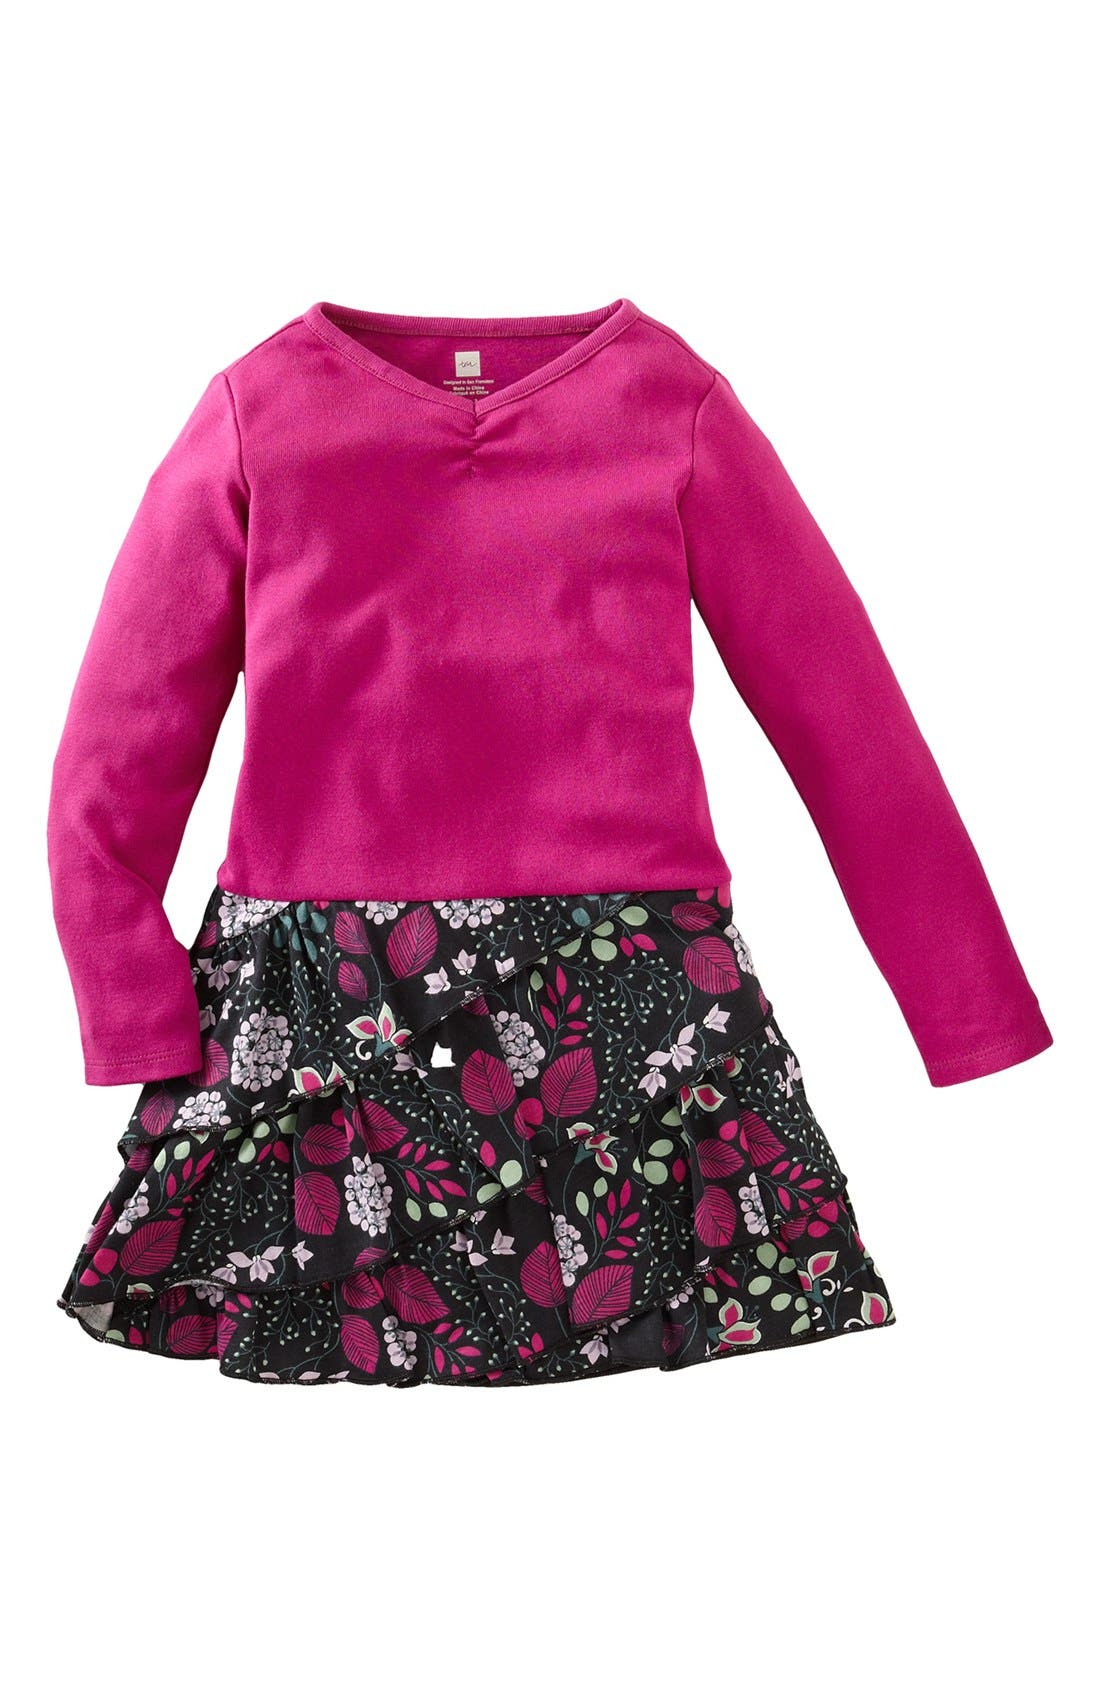 Alternate Image 1 Selected - Tea Collection 'Botanical' Ruffle Dress (Baby Girls)